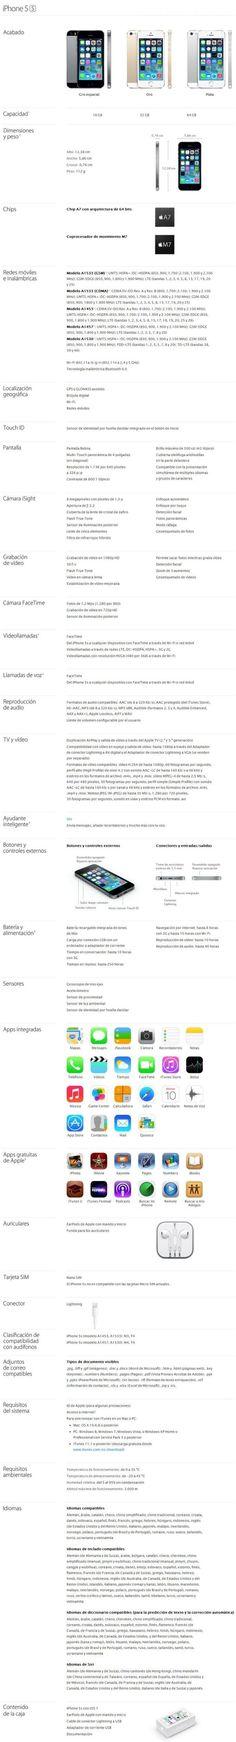 iPhone 5S: especificaciones completas #infografia